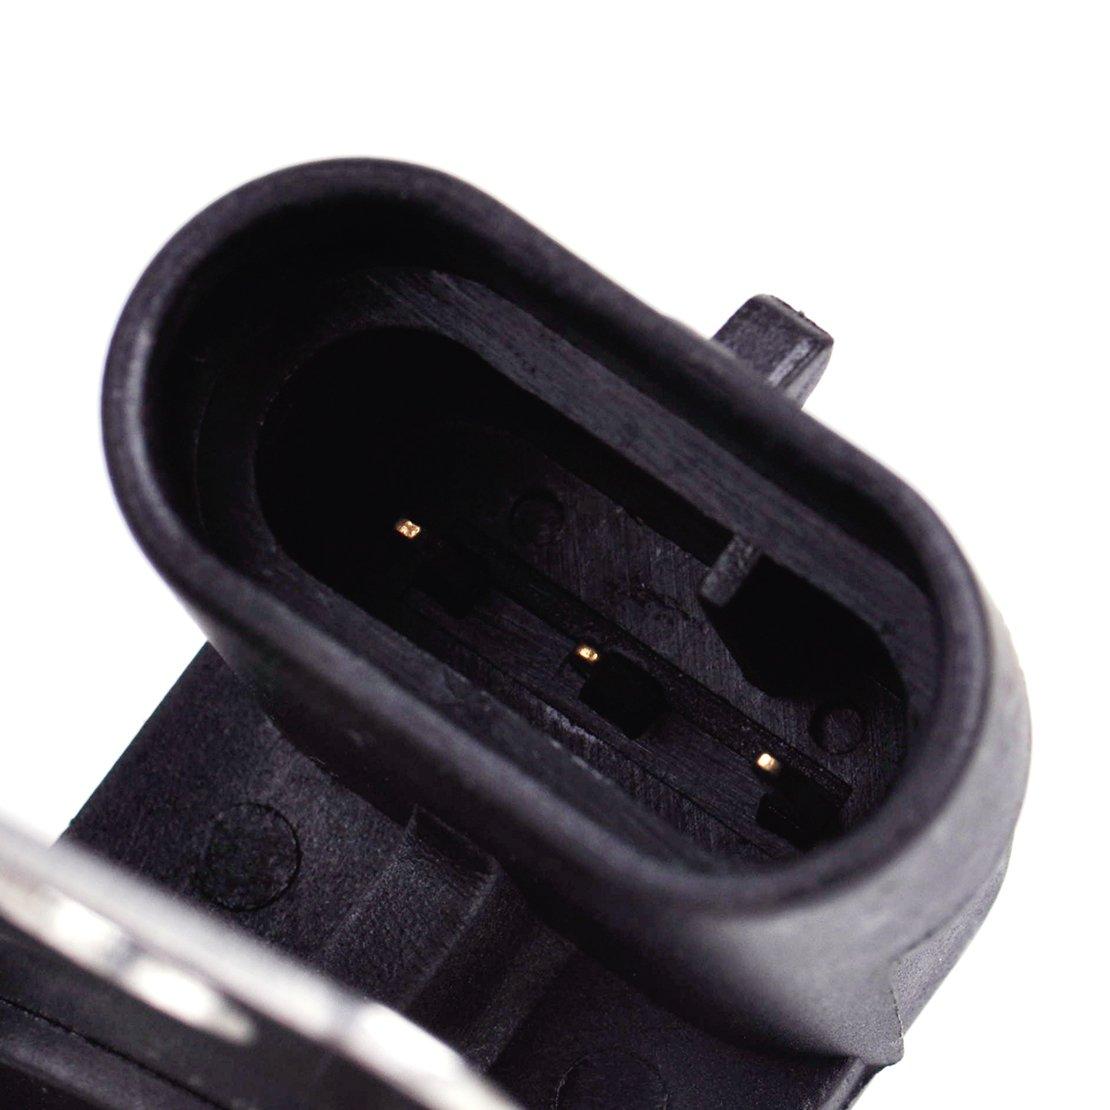 beler CPS Engine Crankshaft Crank Position Sensor fit for Avanti Buick Cadillac Chevrolet GMC PC278